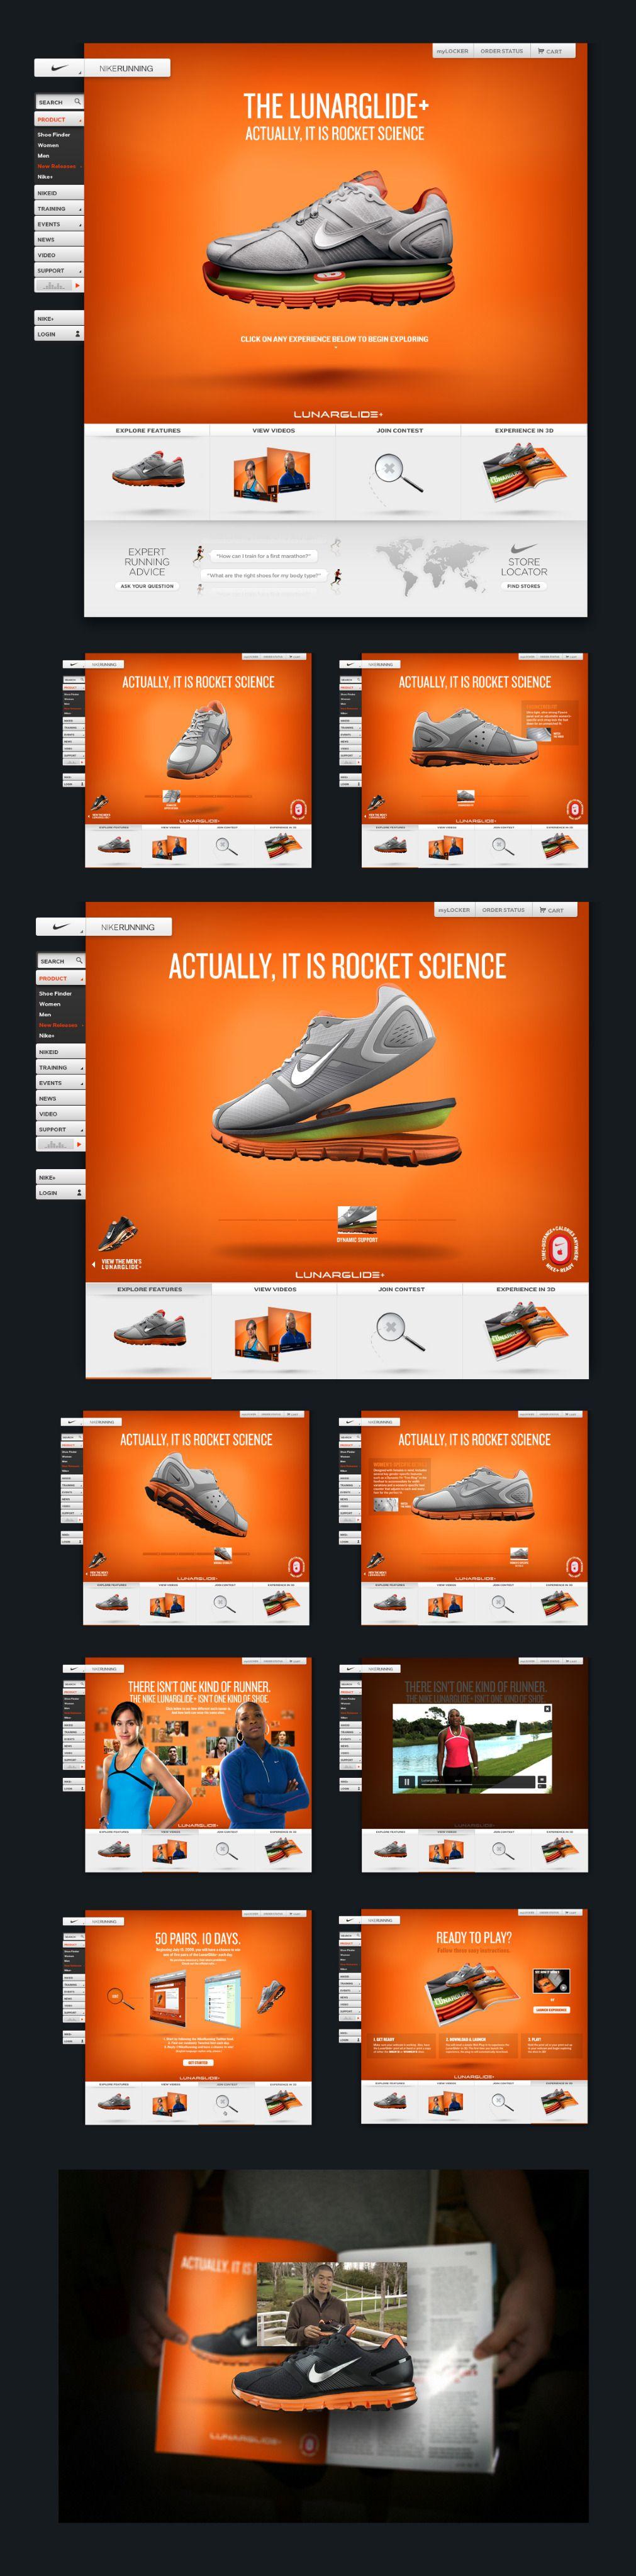 Nike Air Max 1 Illustration on Behance